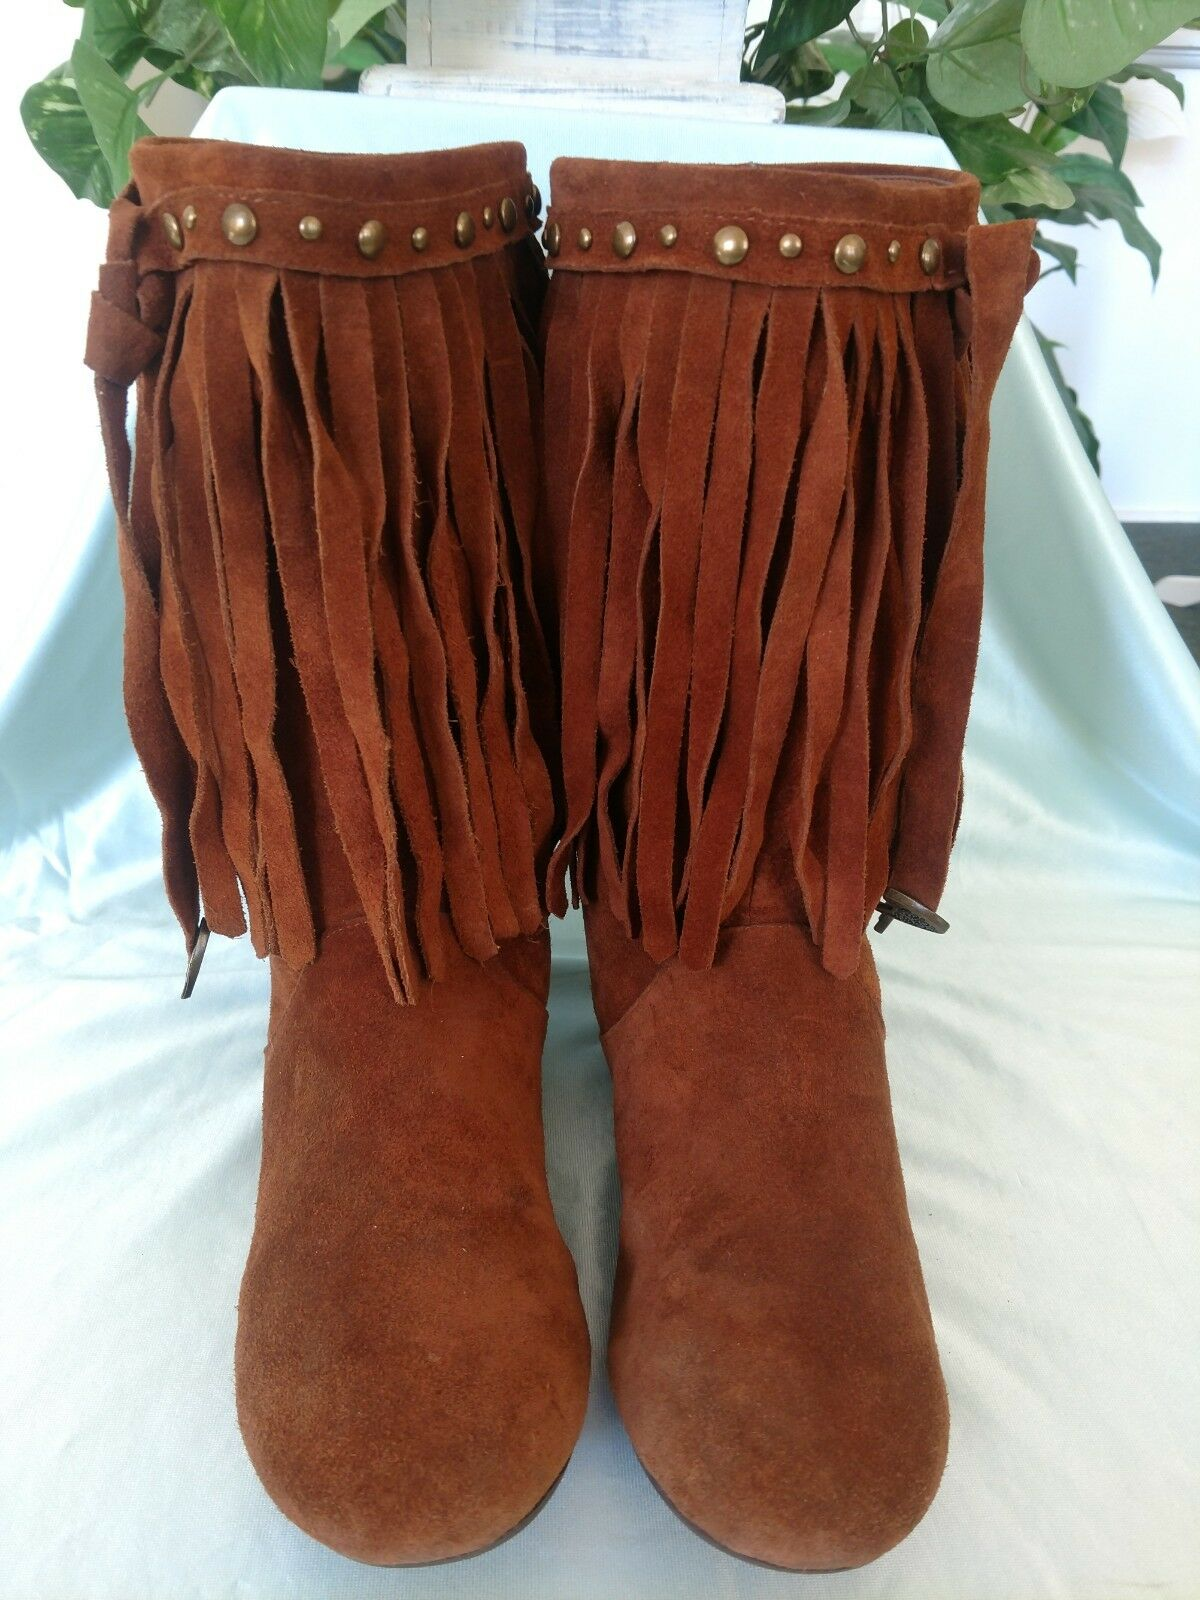 ALDO Moccasin Boots Women's Sz. 8.5 () Fringed Suede Brass Studs 11  Shaft